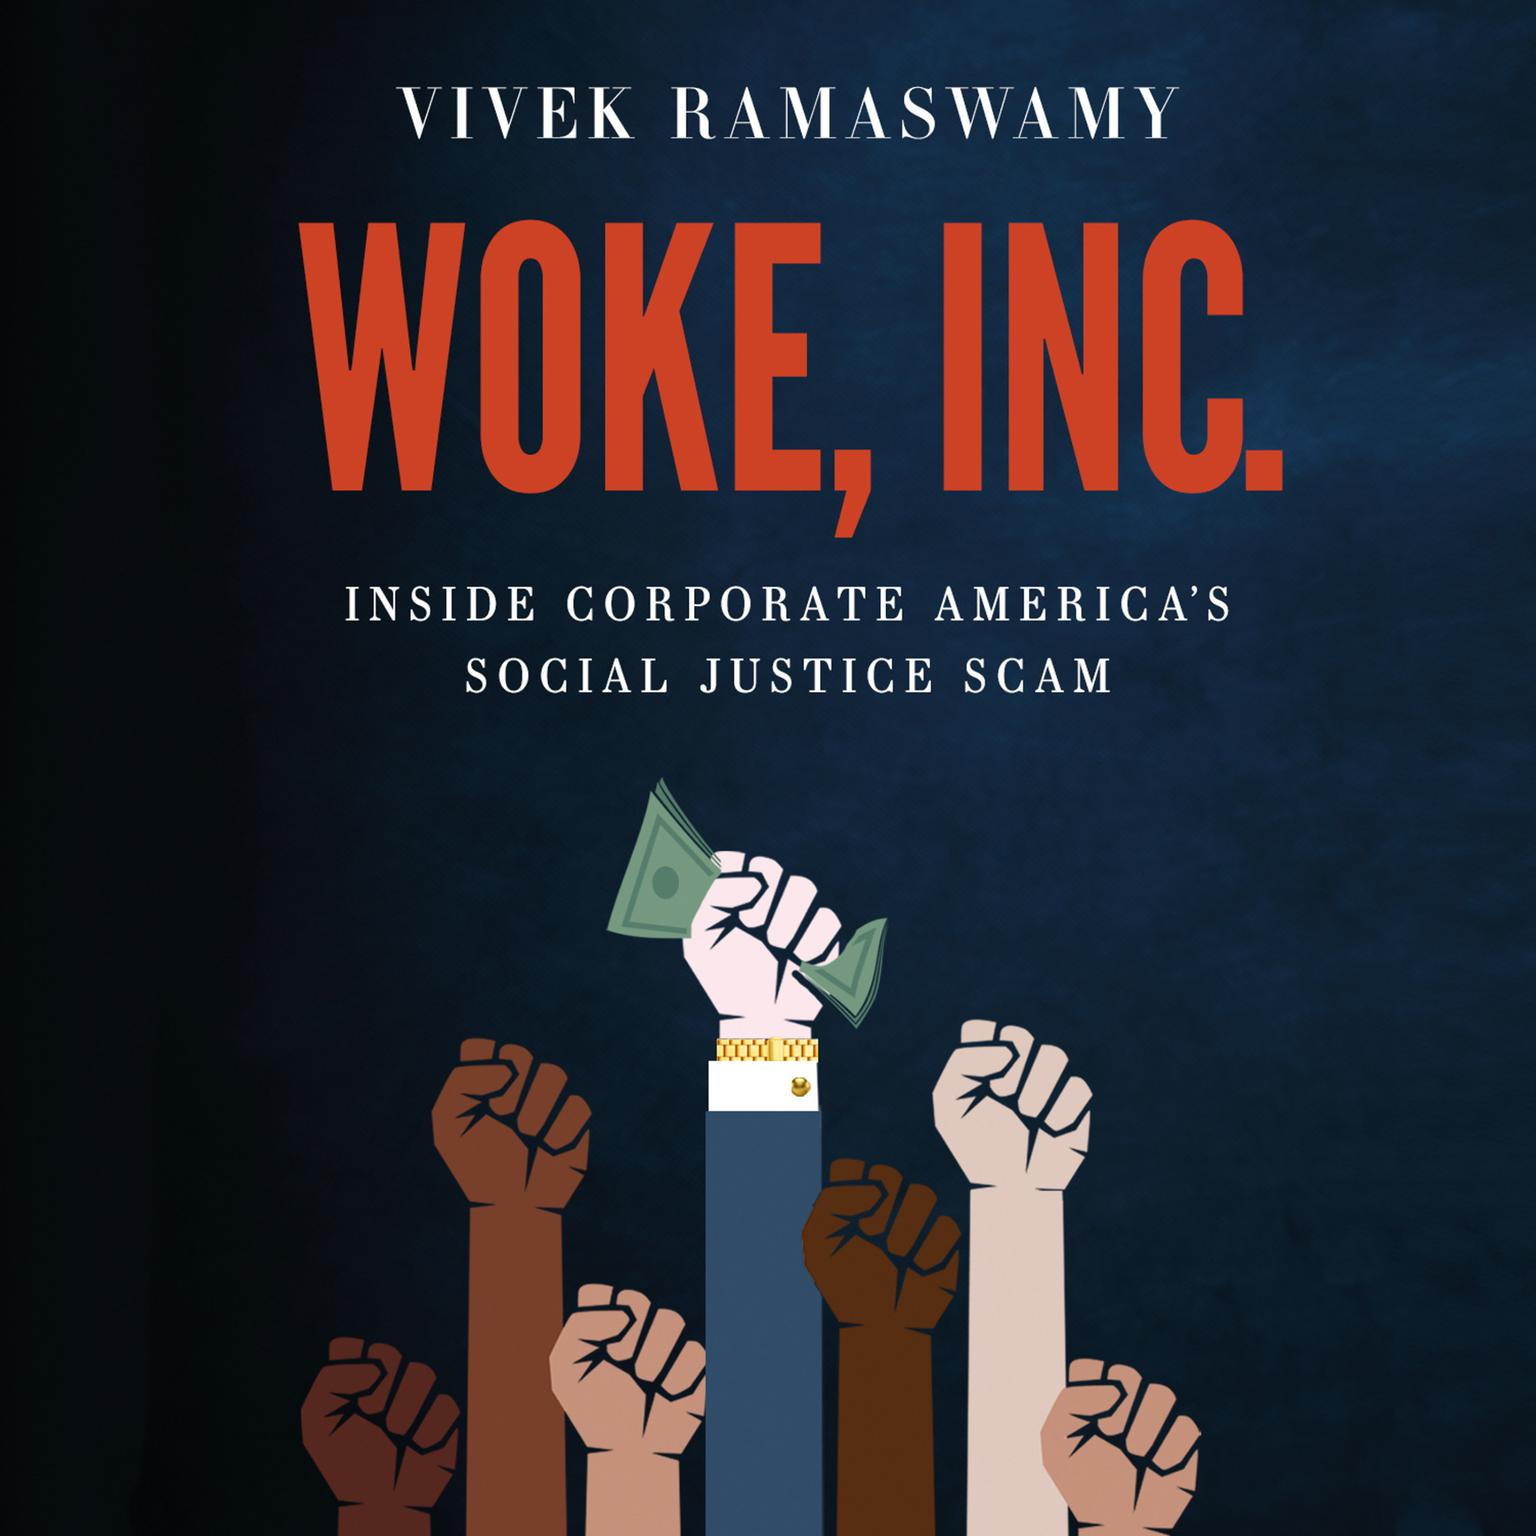 Woke, Inc.: Inside Corporate Americas Social Justice Scam Audiobook, by Vivek Ramaswamy